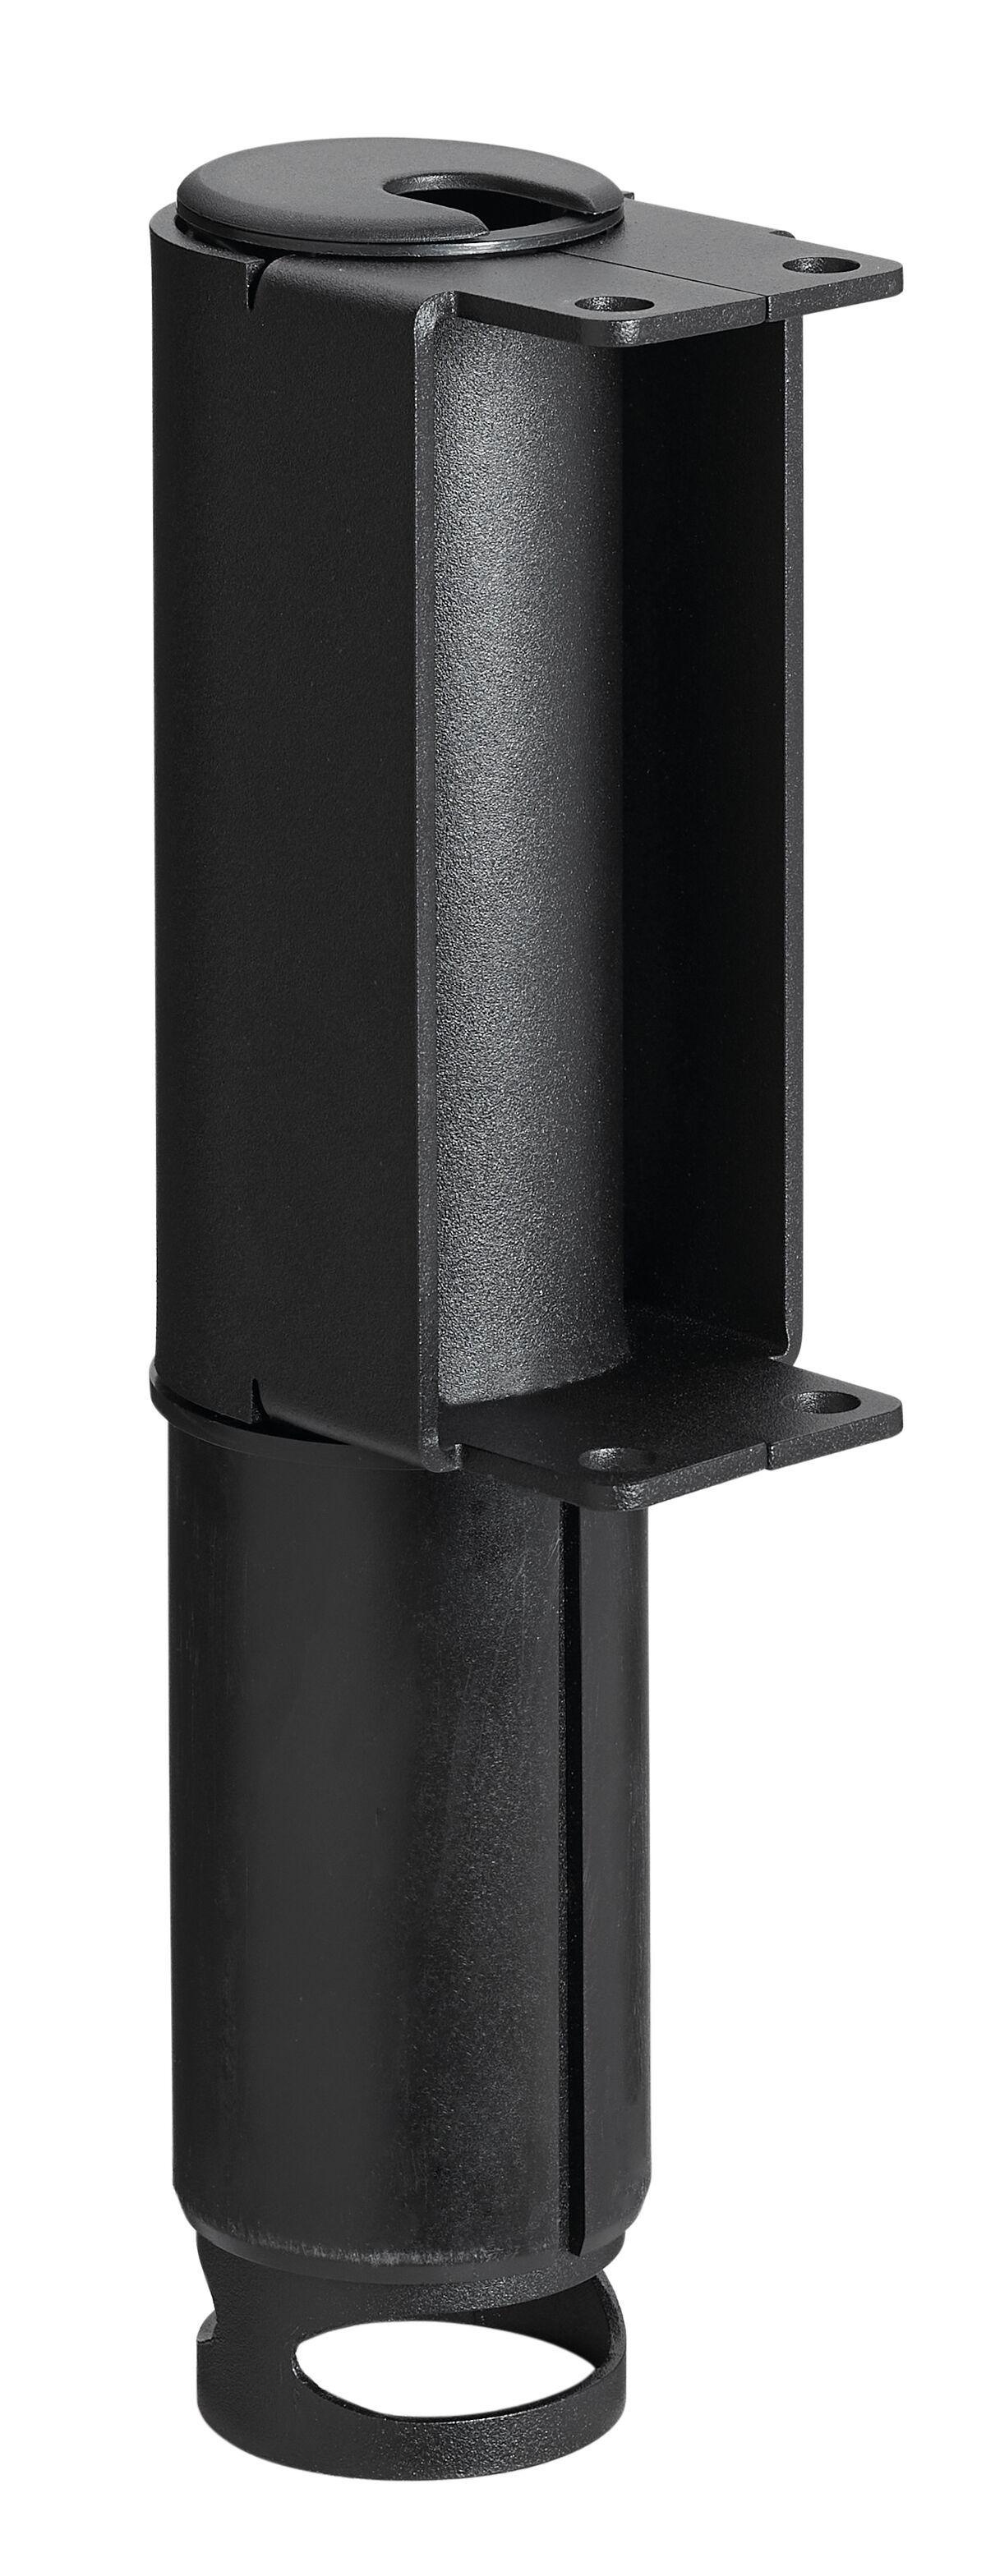 Vogel's PFA 9148 Rotationsmodul - Product